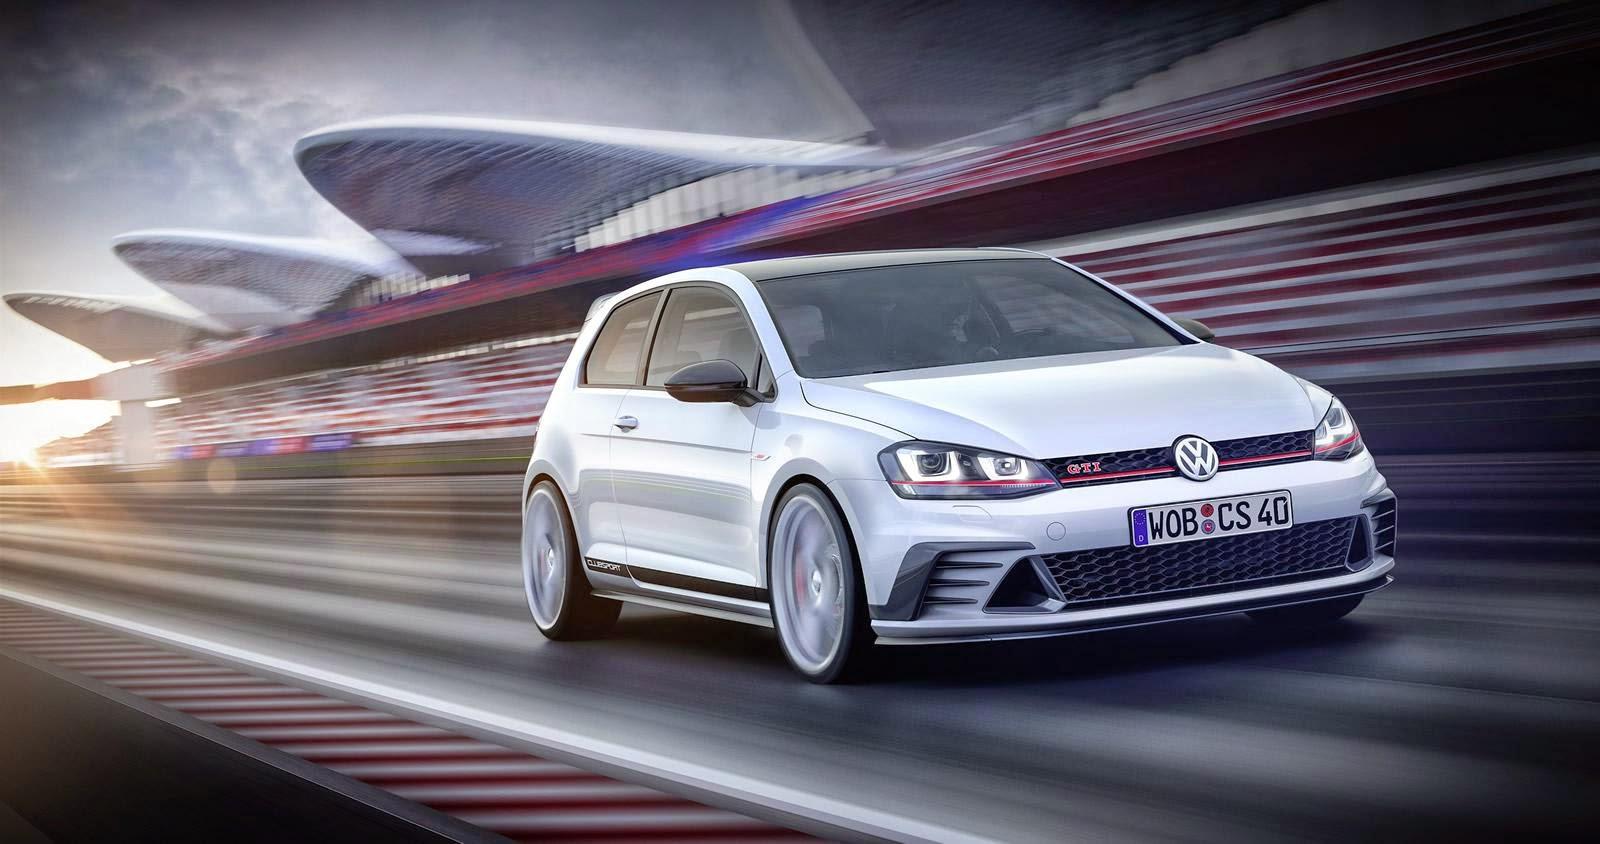 [Resim: Volkswagen%2BGolf%2BGTI%2BClubsport%2B1.jpg]